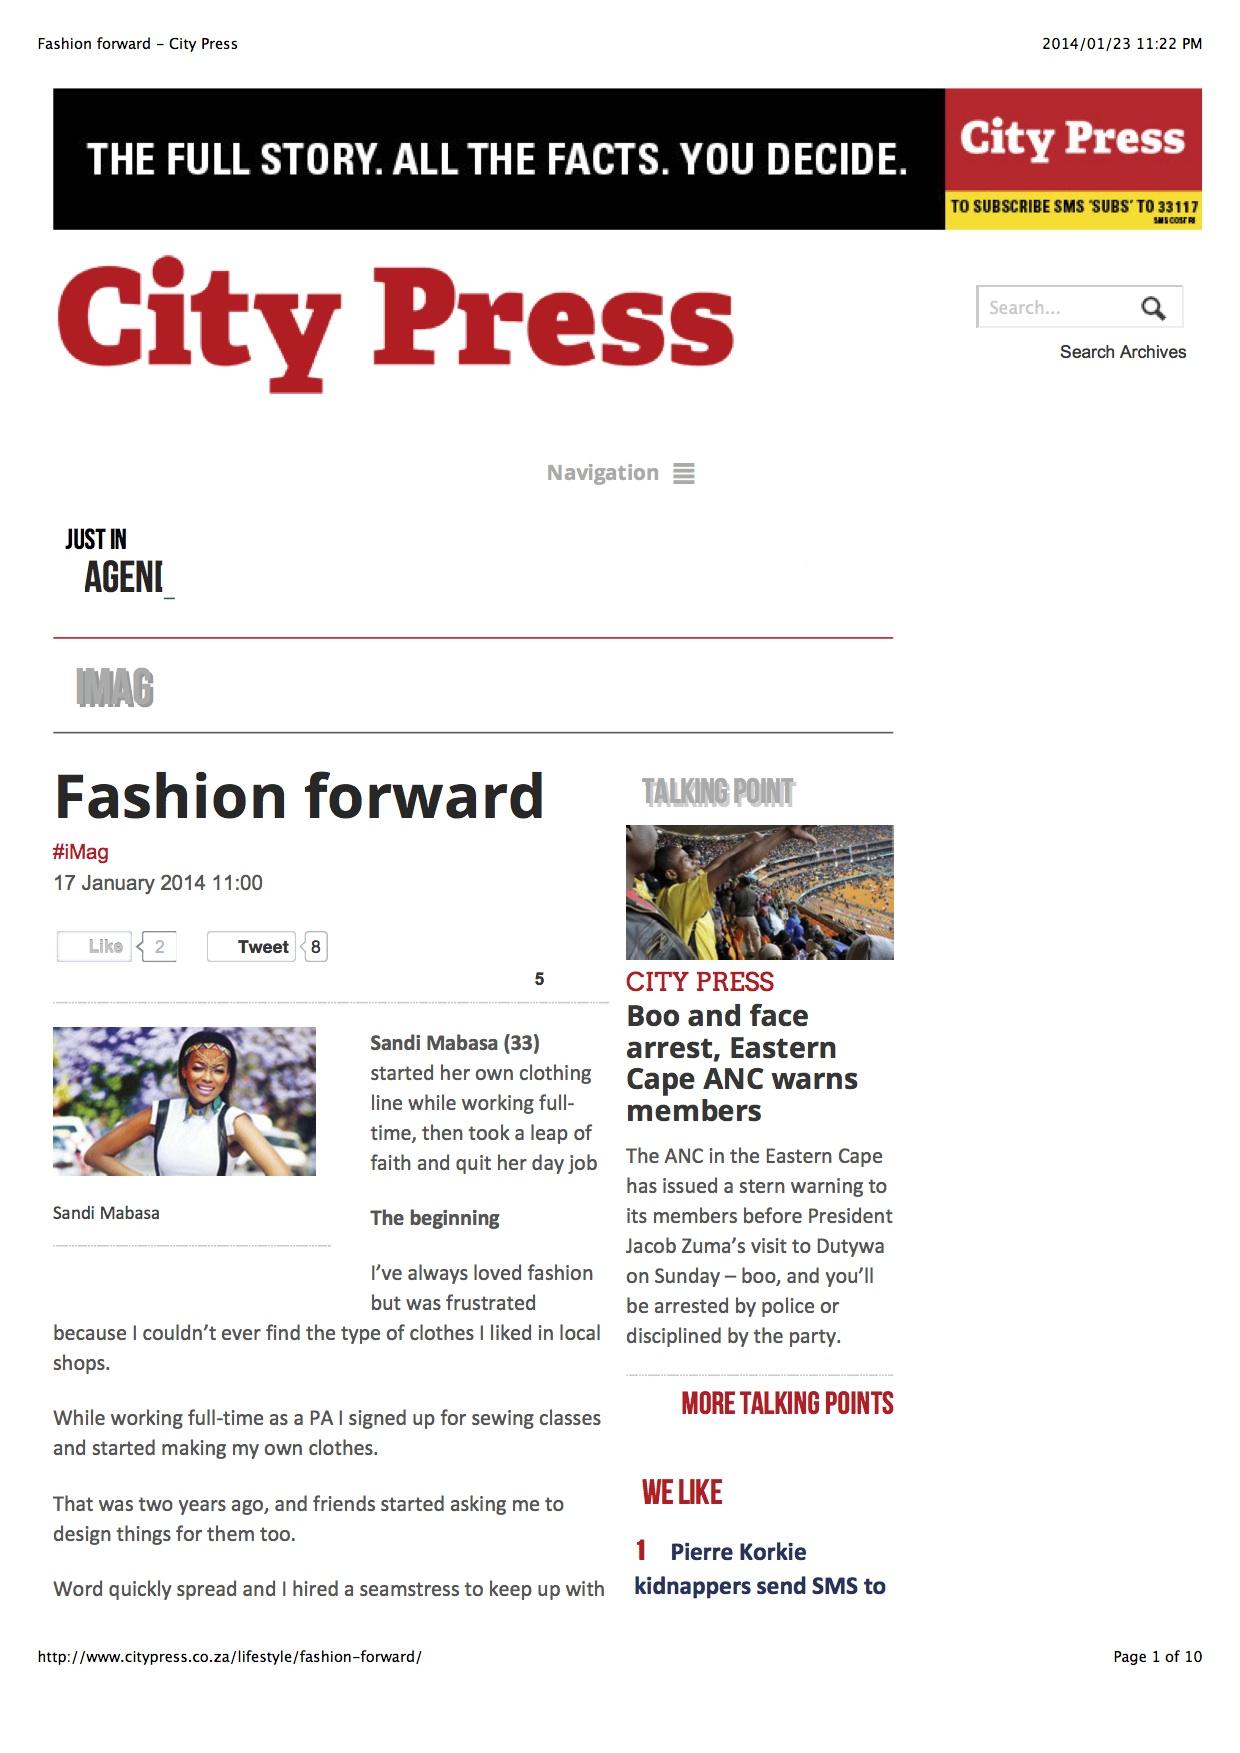 City Press-News24